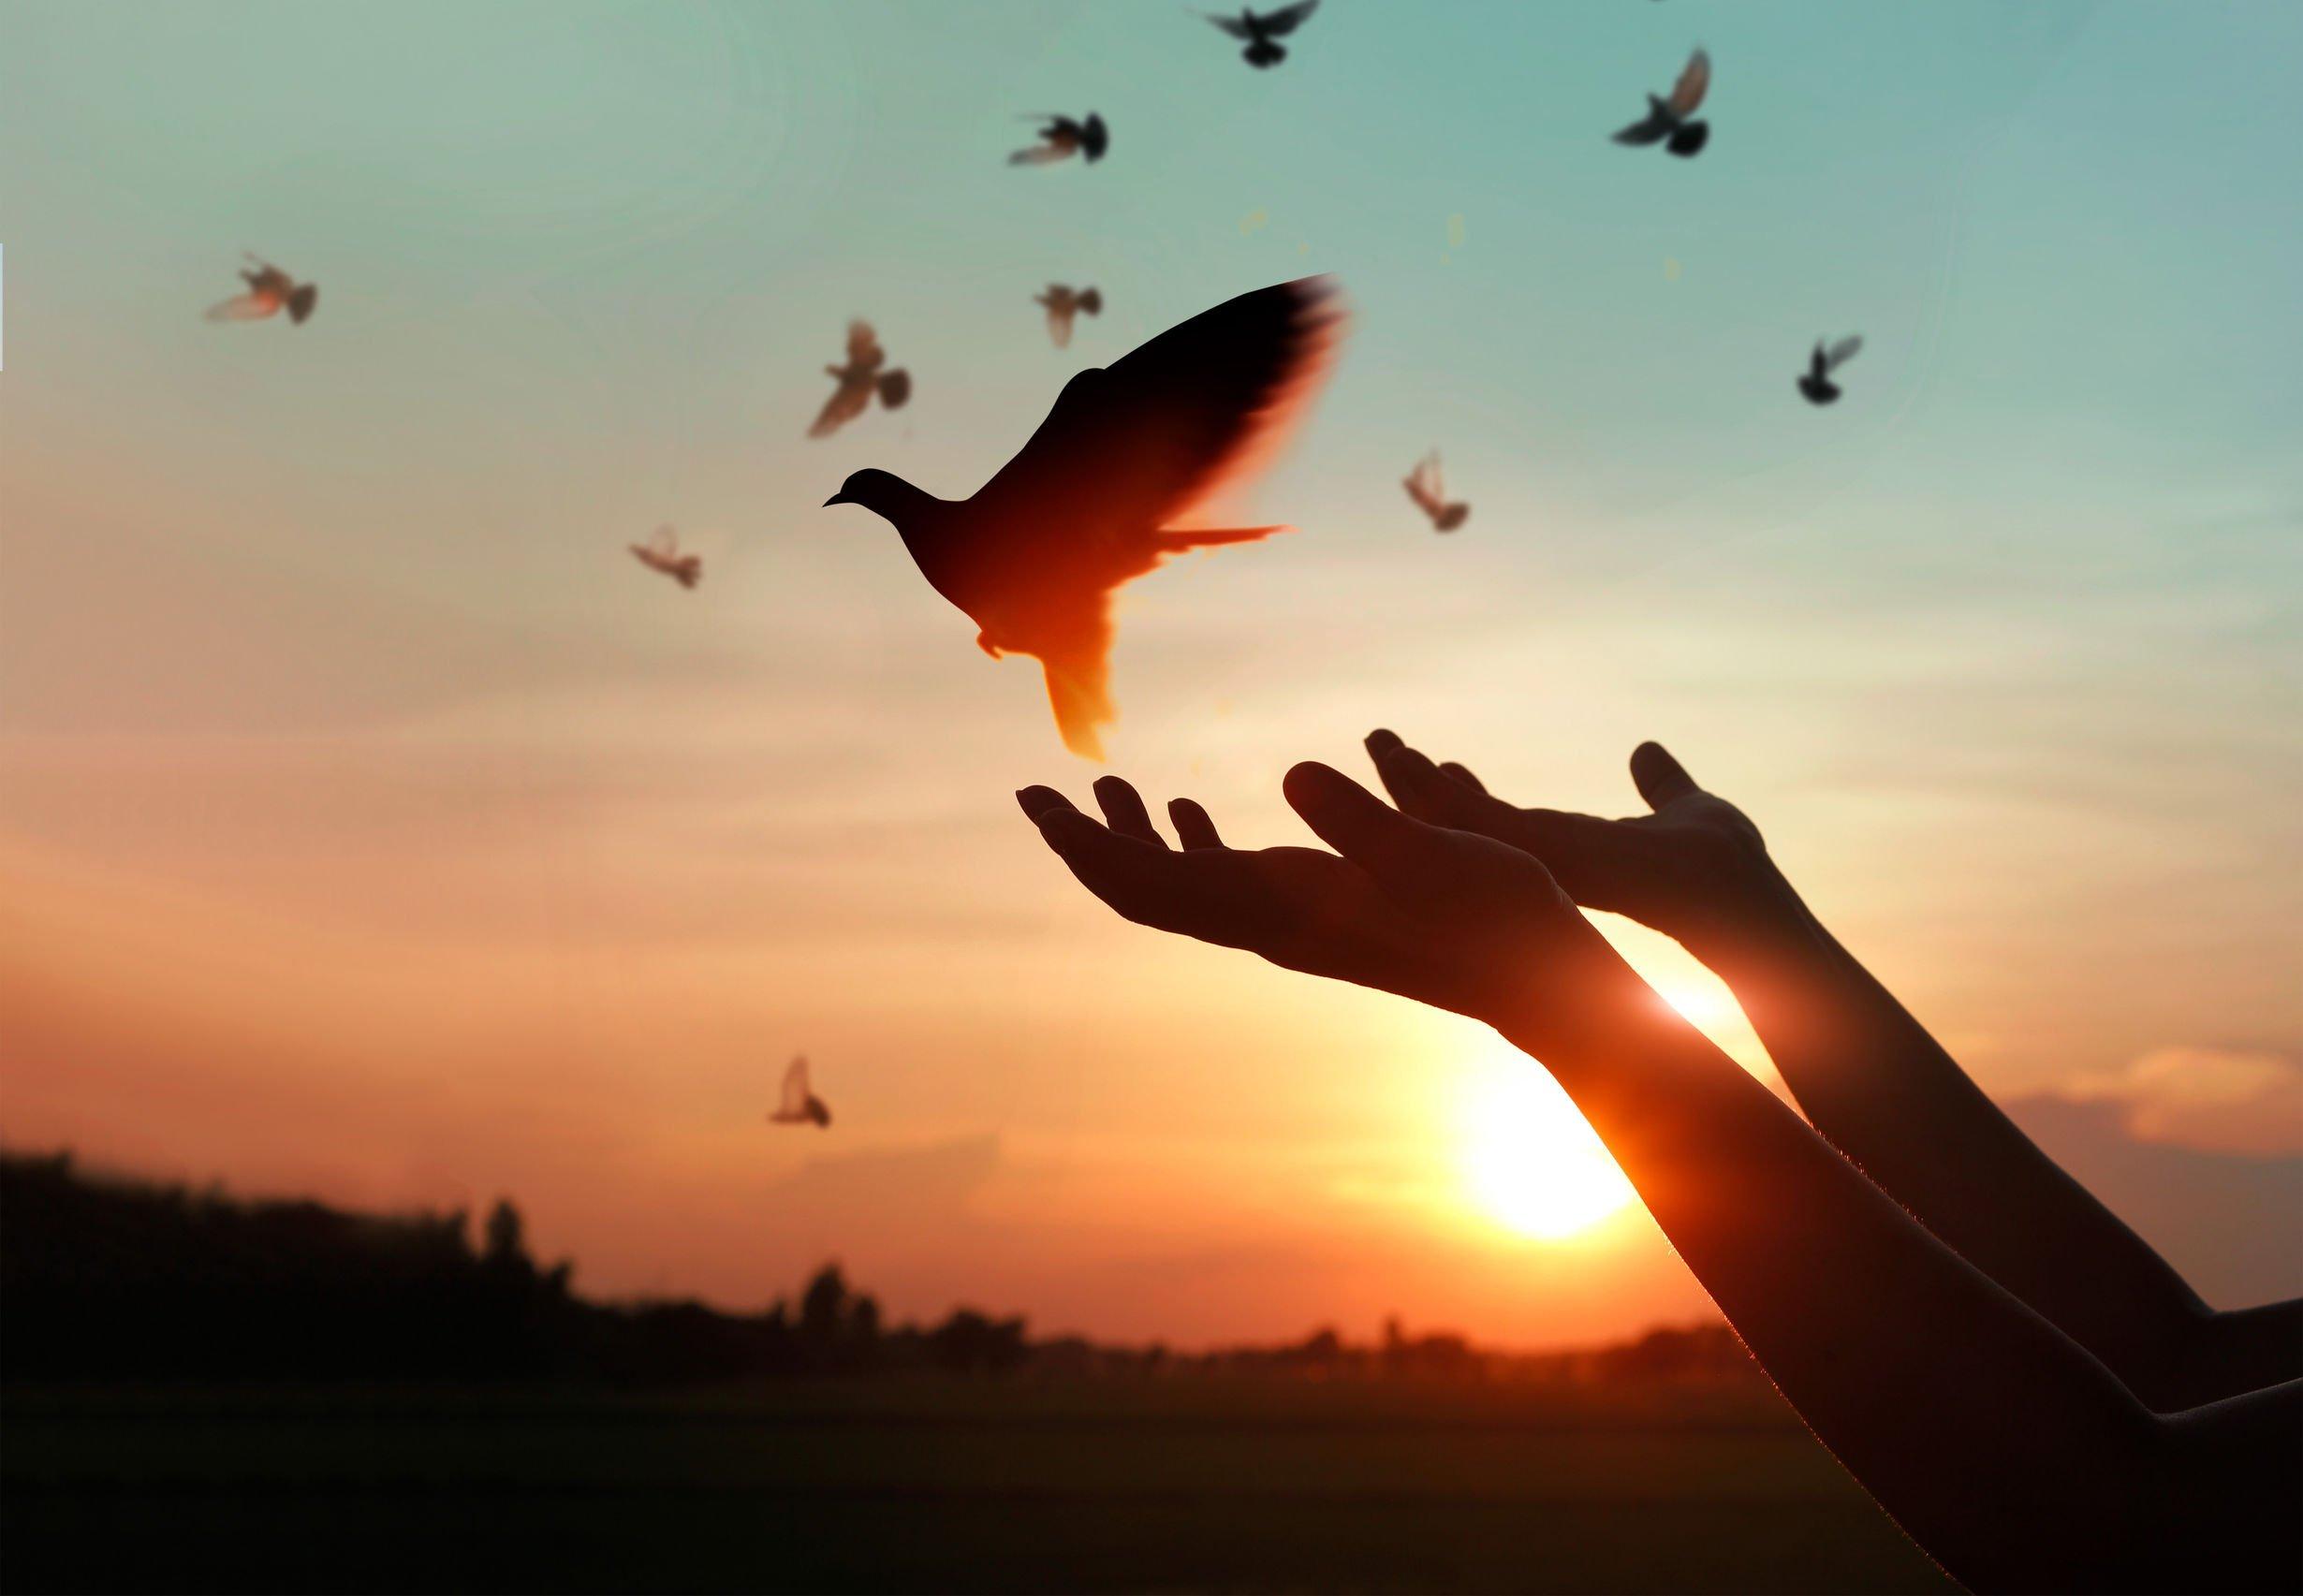 Friede sei mit dir